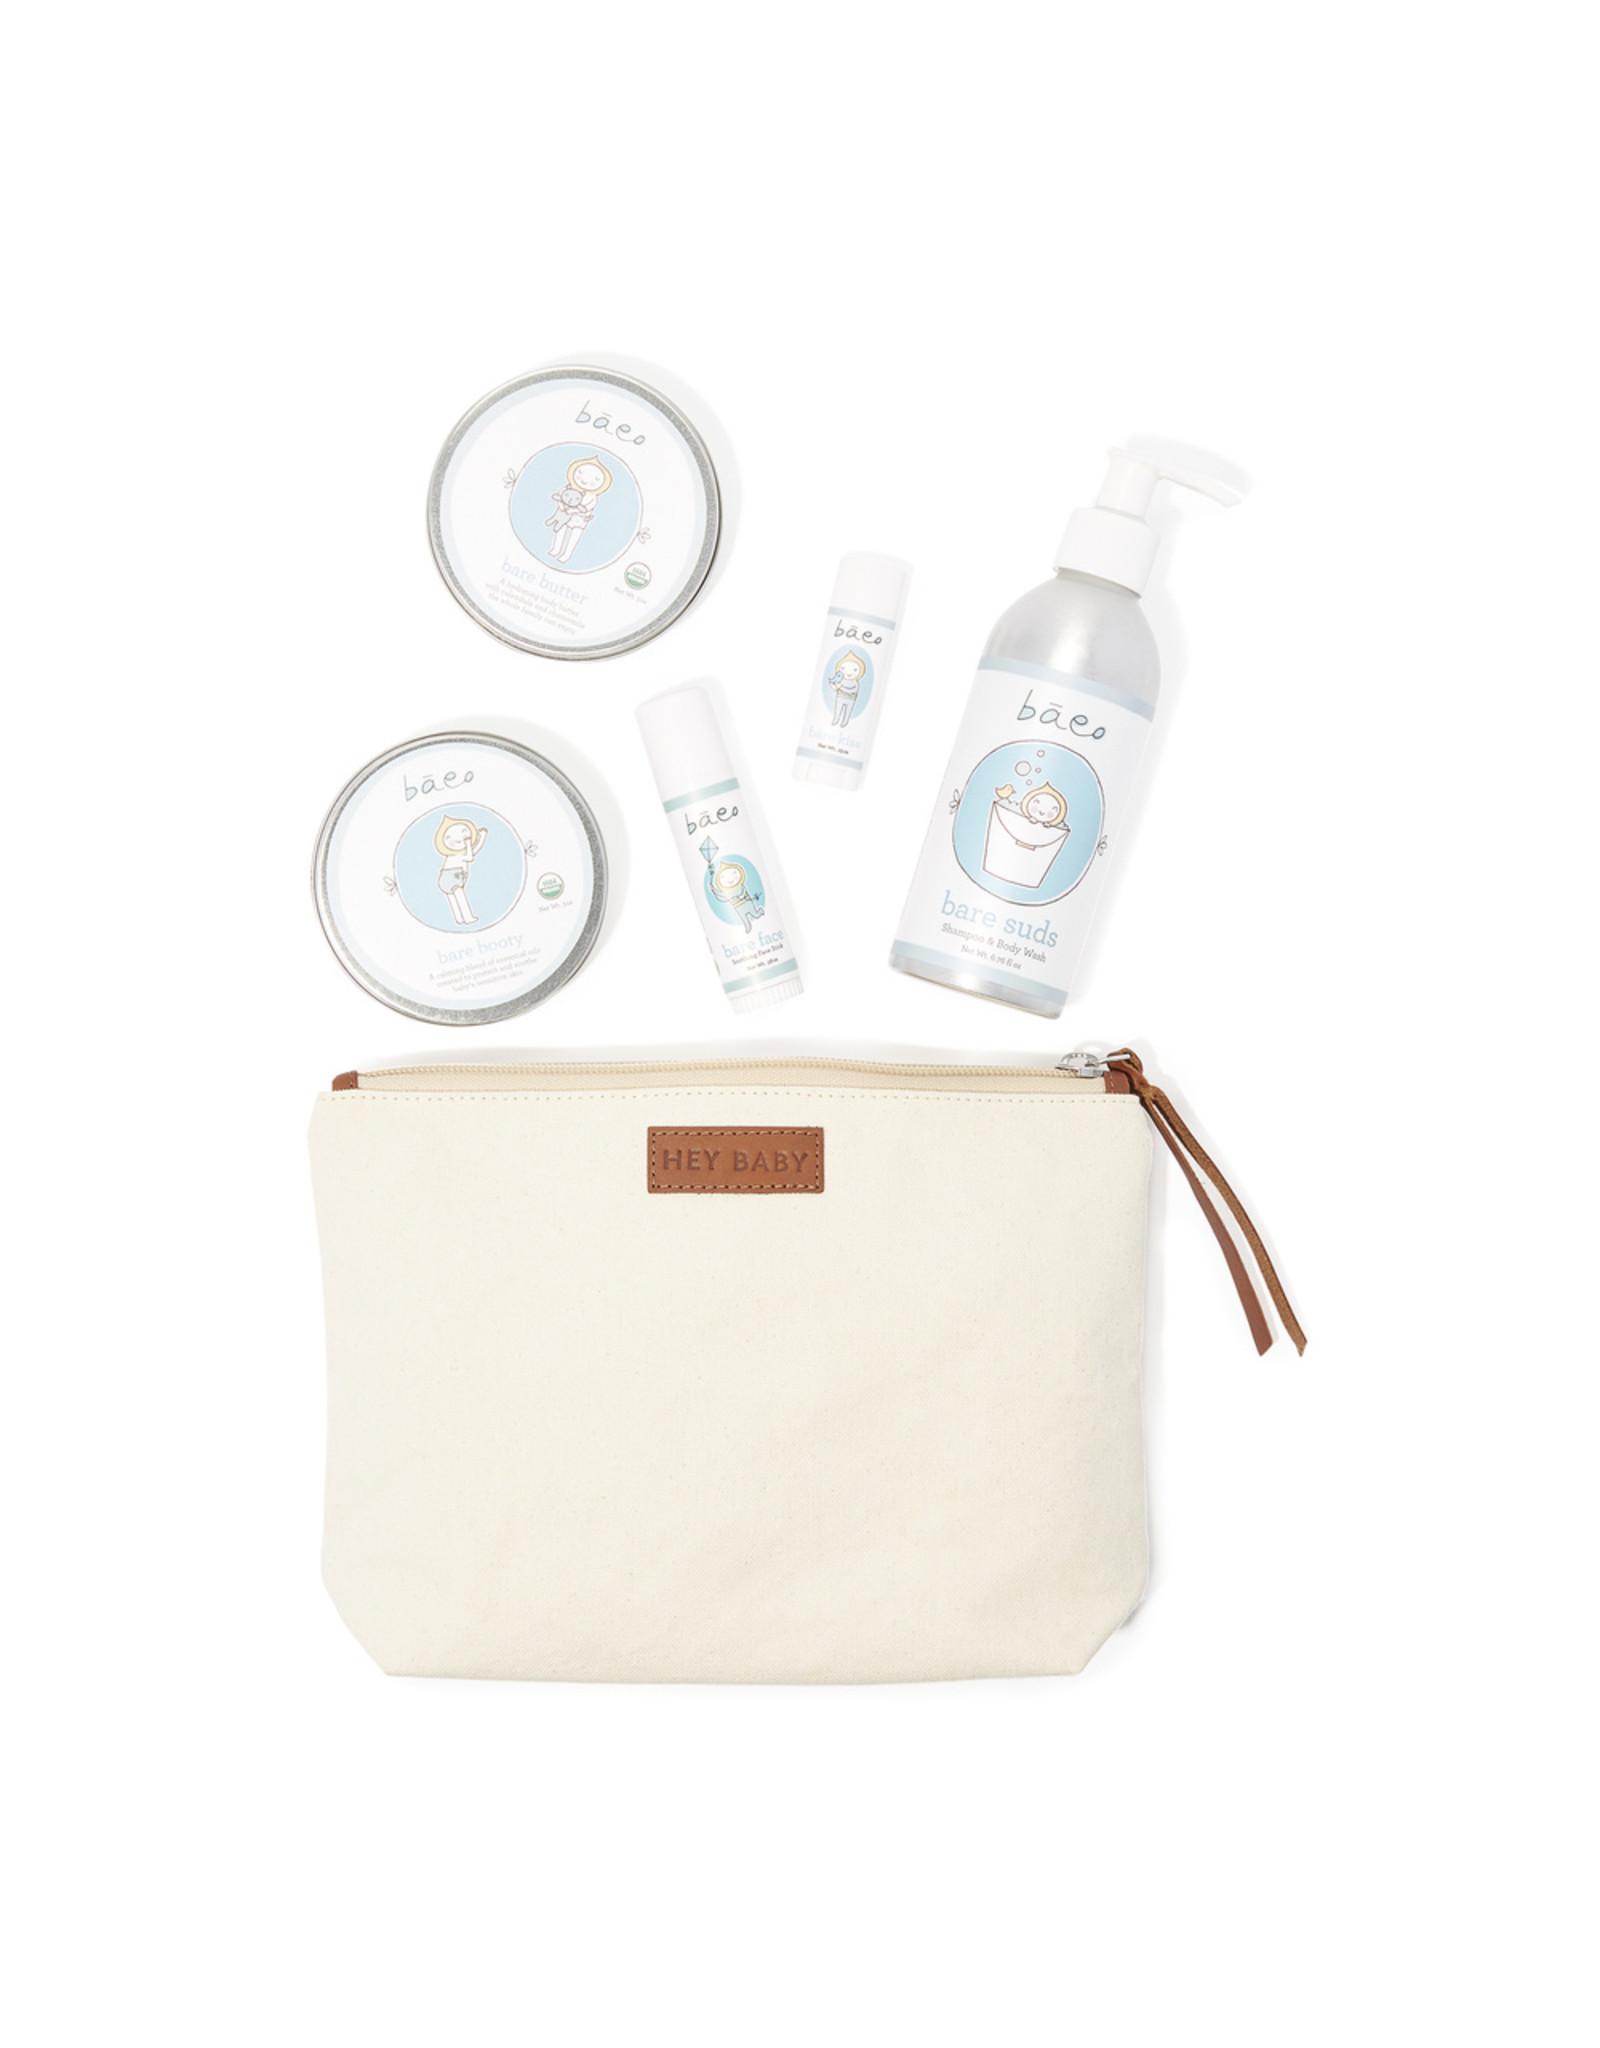 Baeo Baby Baeo Baby Limited Edition Baeo Luxe Gift Set